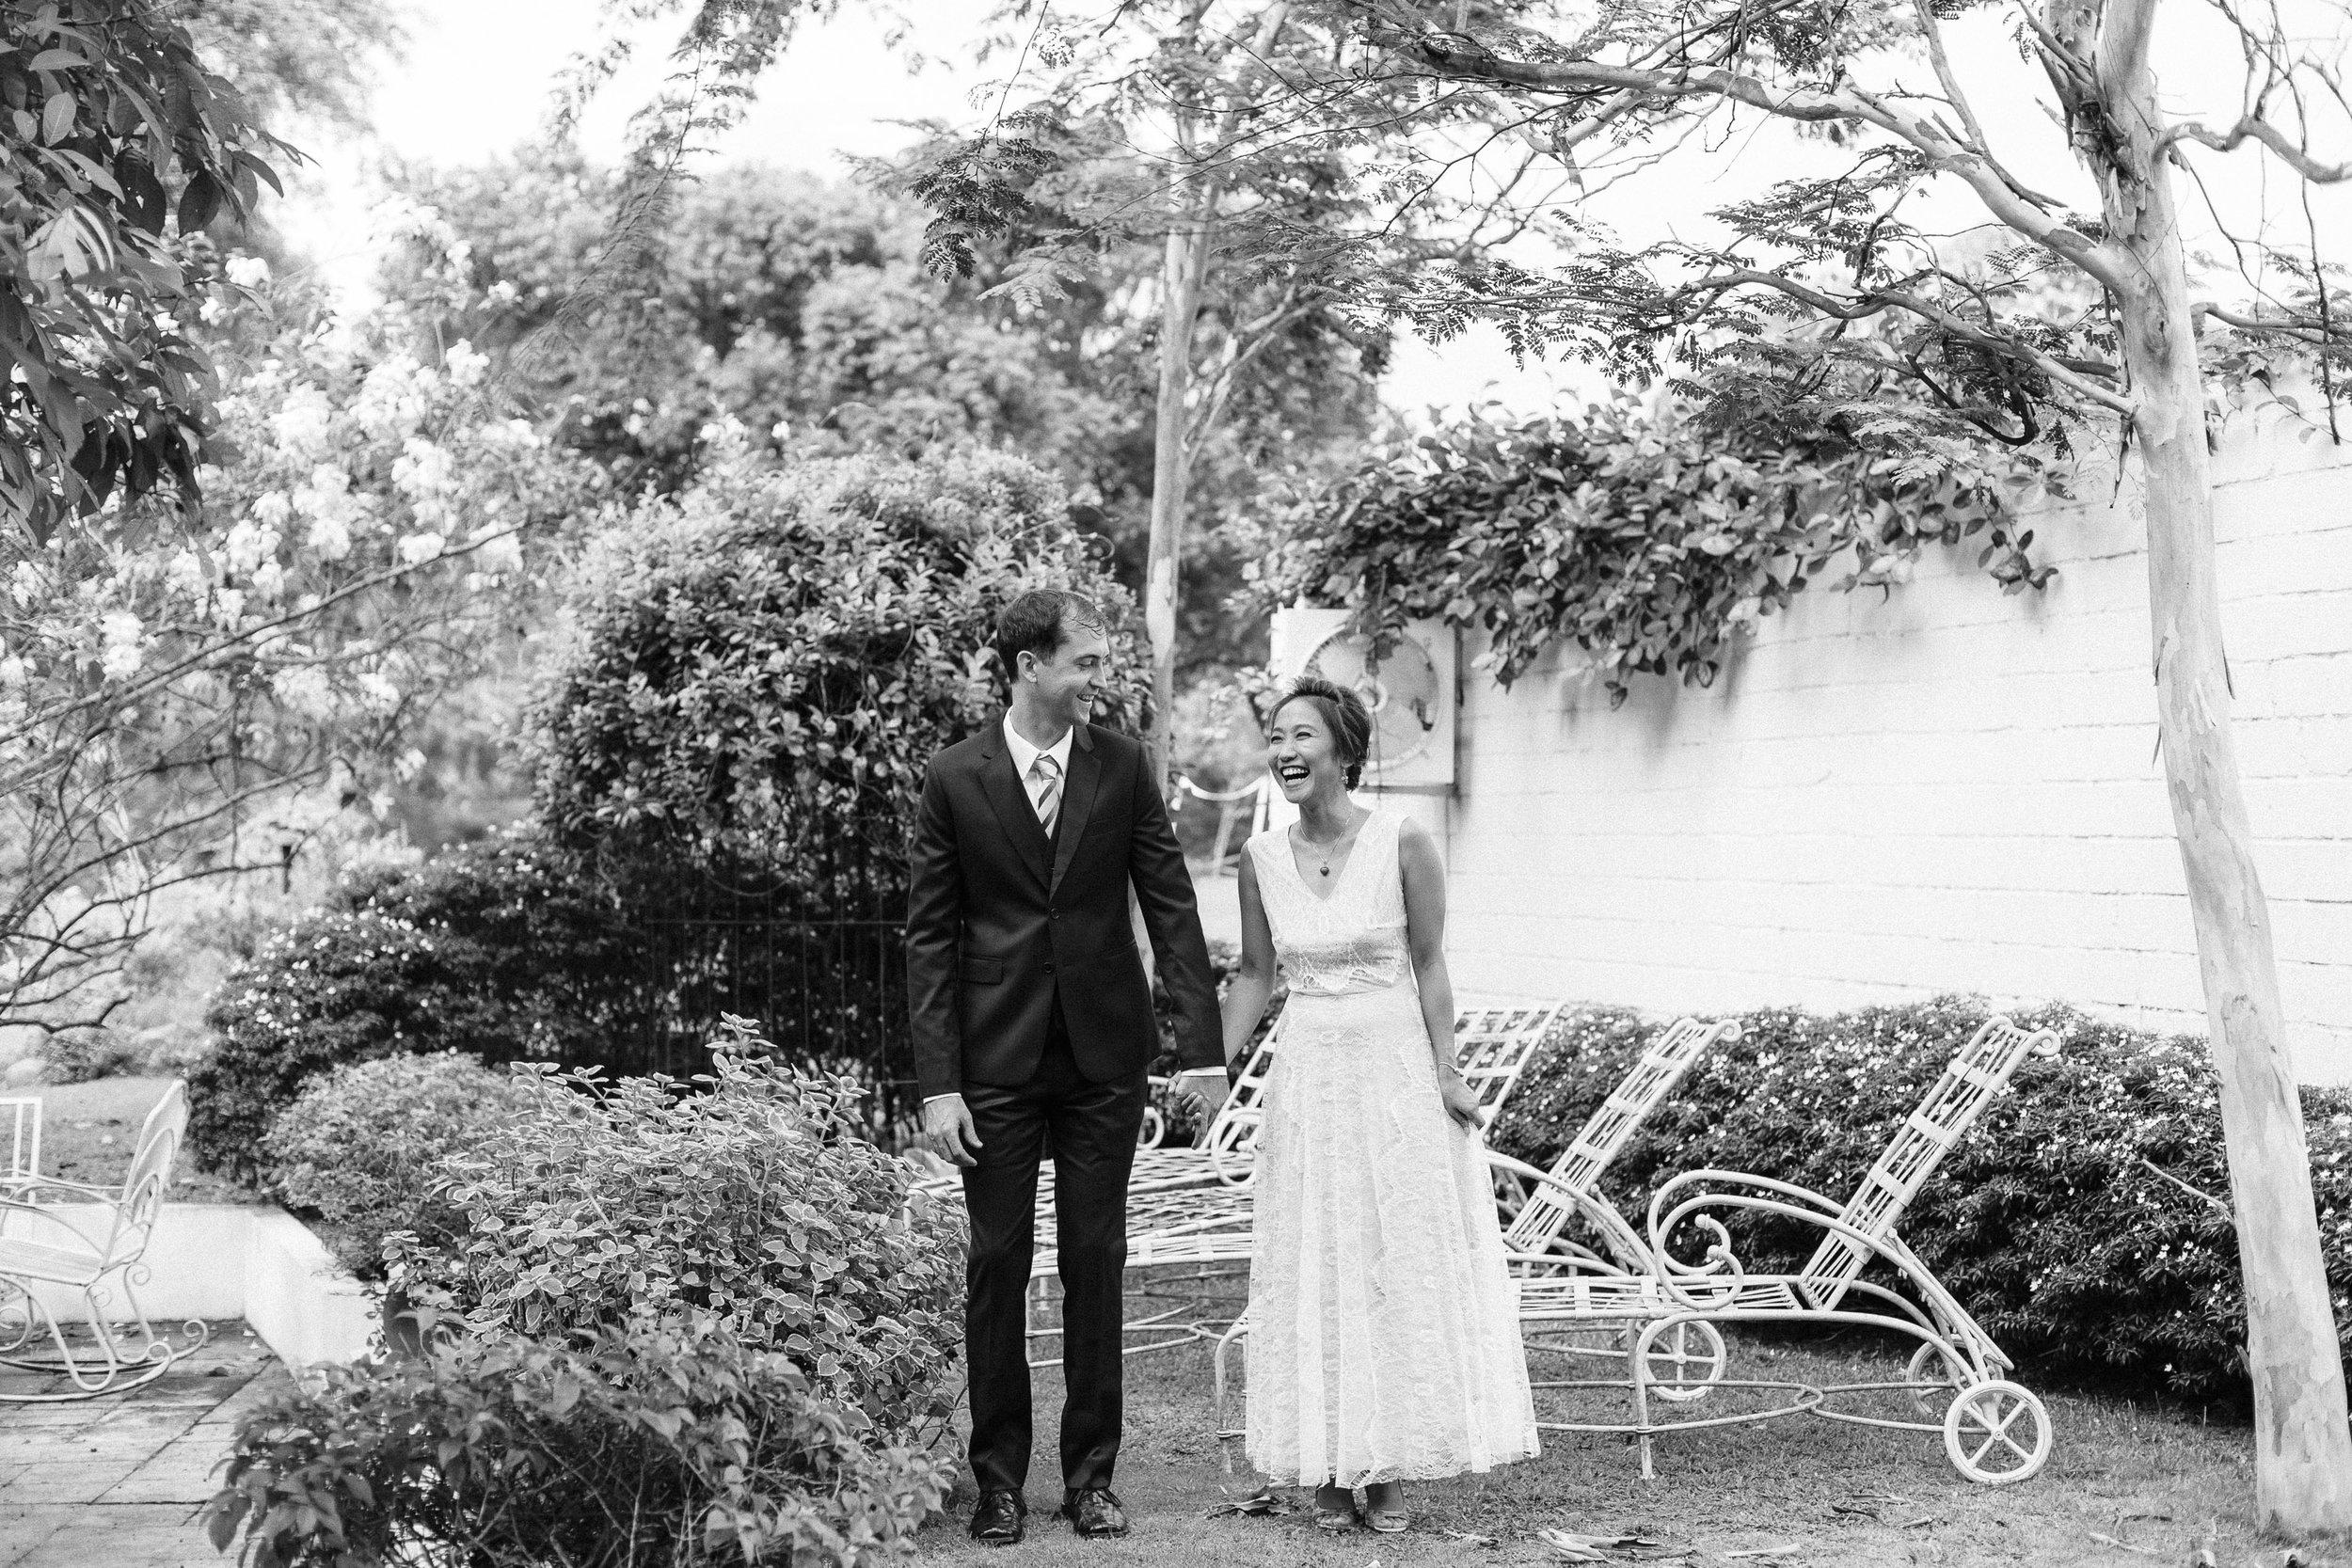 singapore-wedding-photographer-hiram-joyce-015.jpg